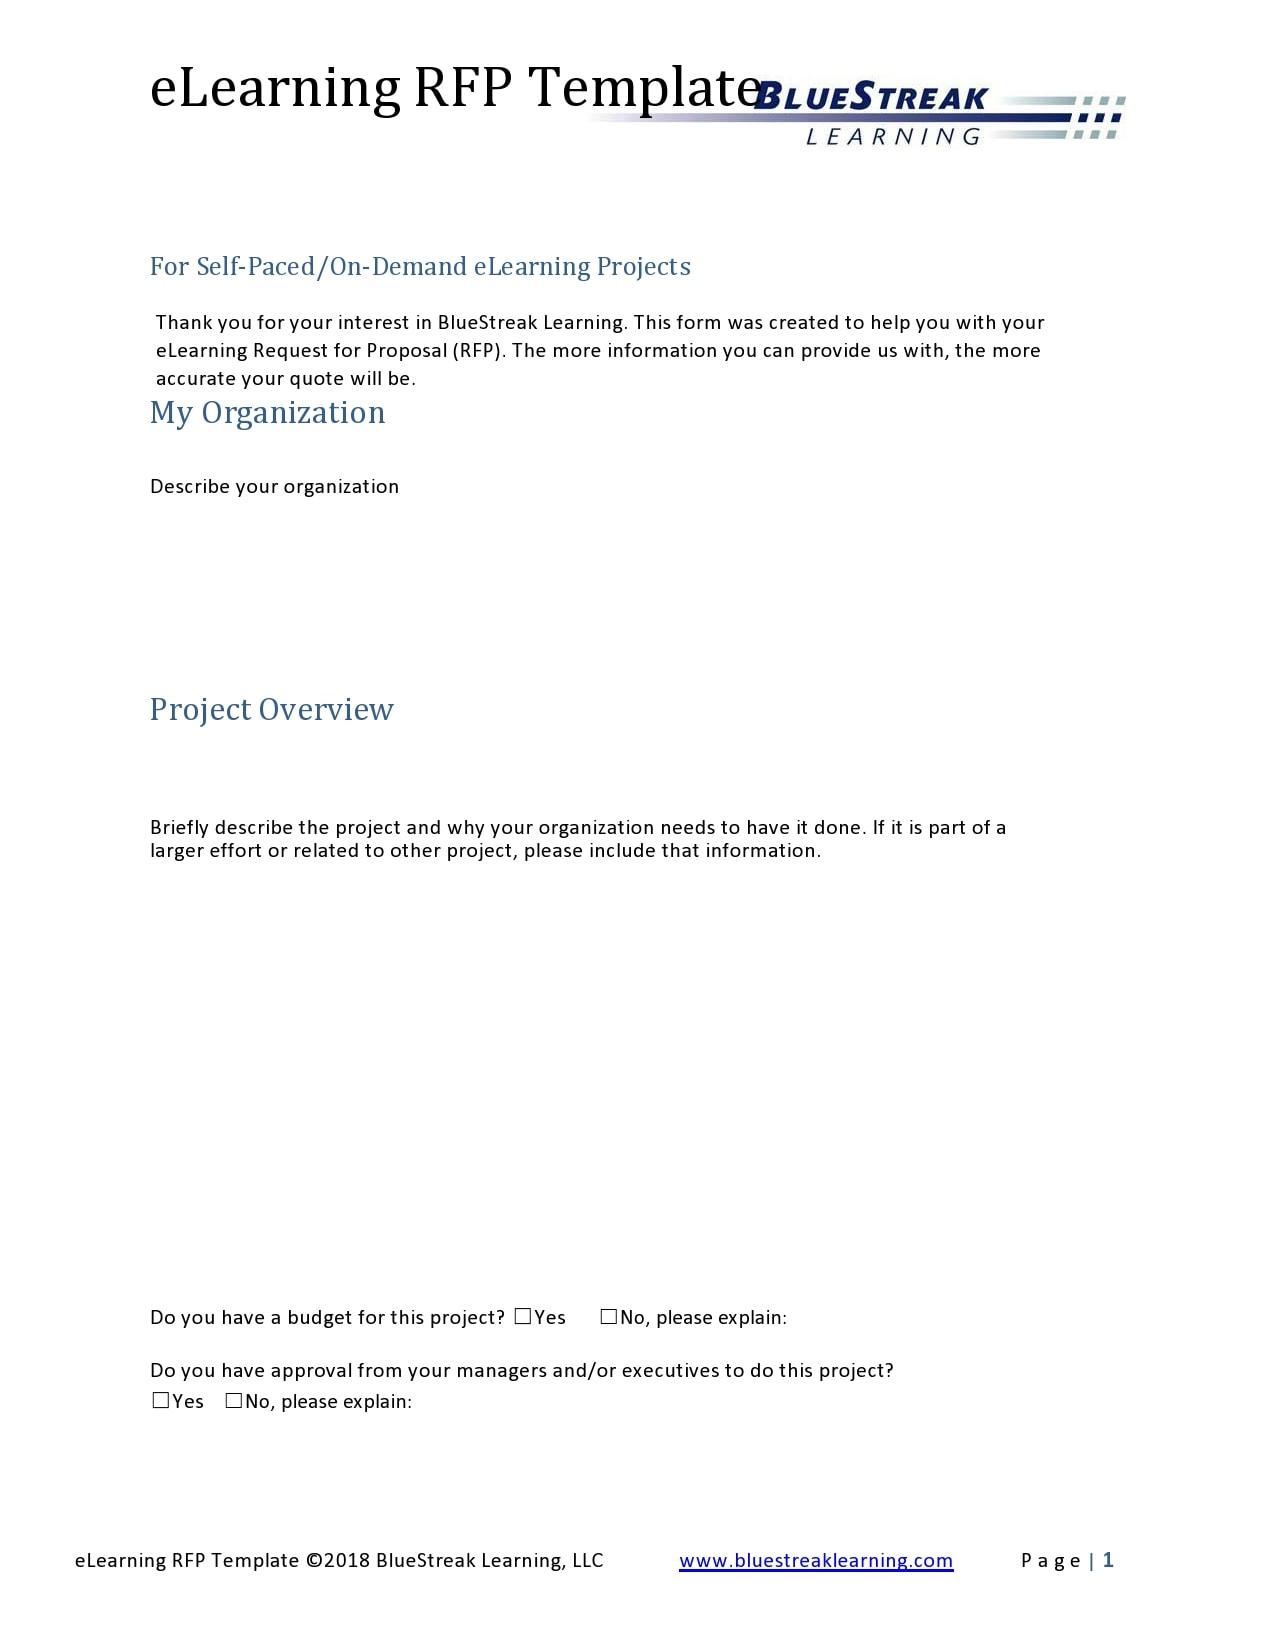 rfp template 13